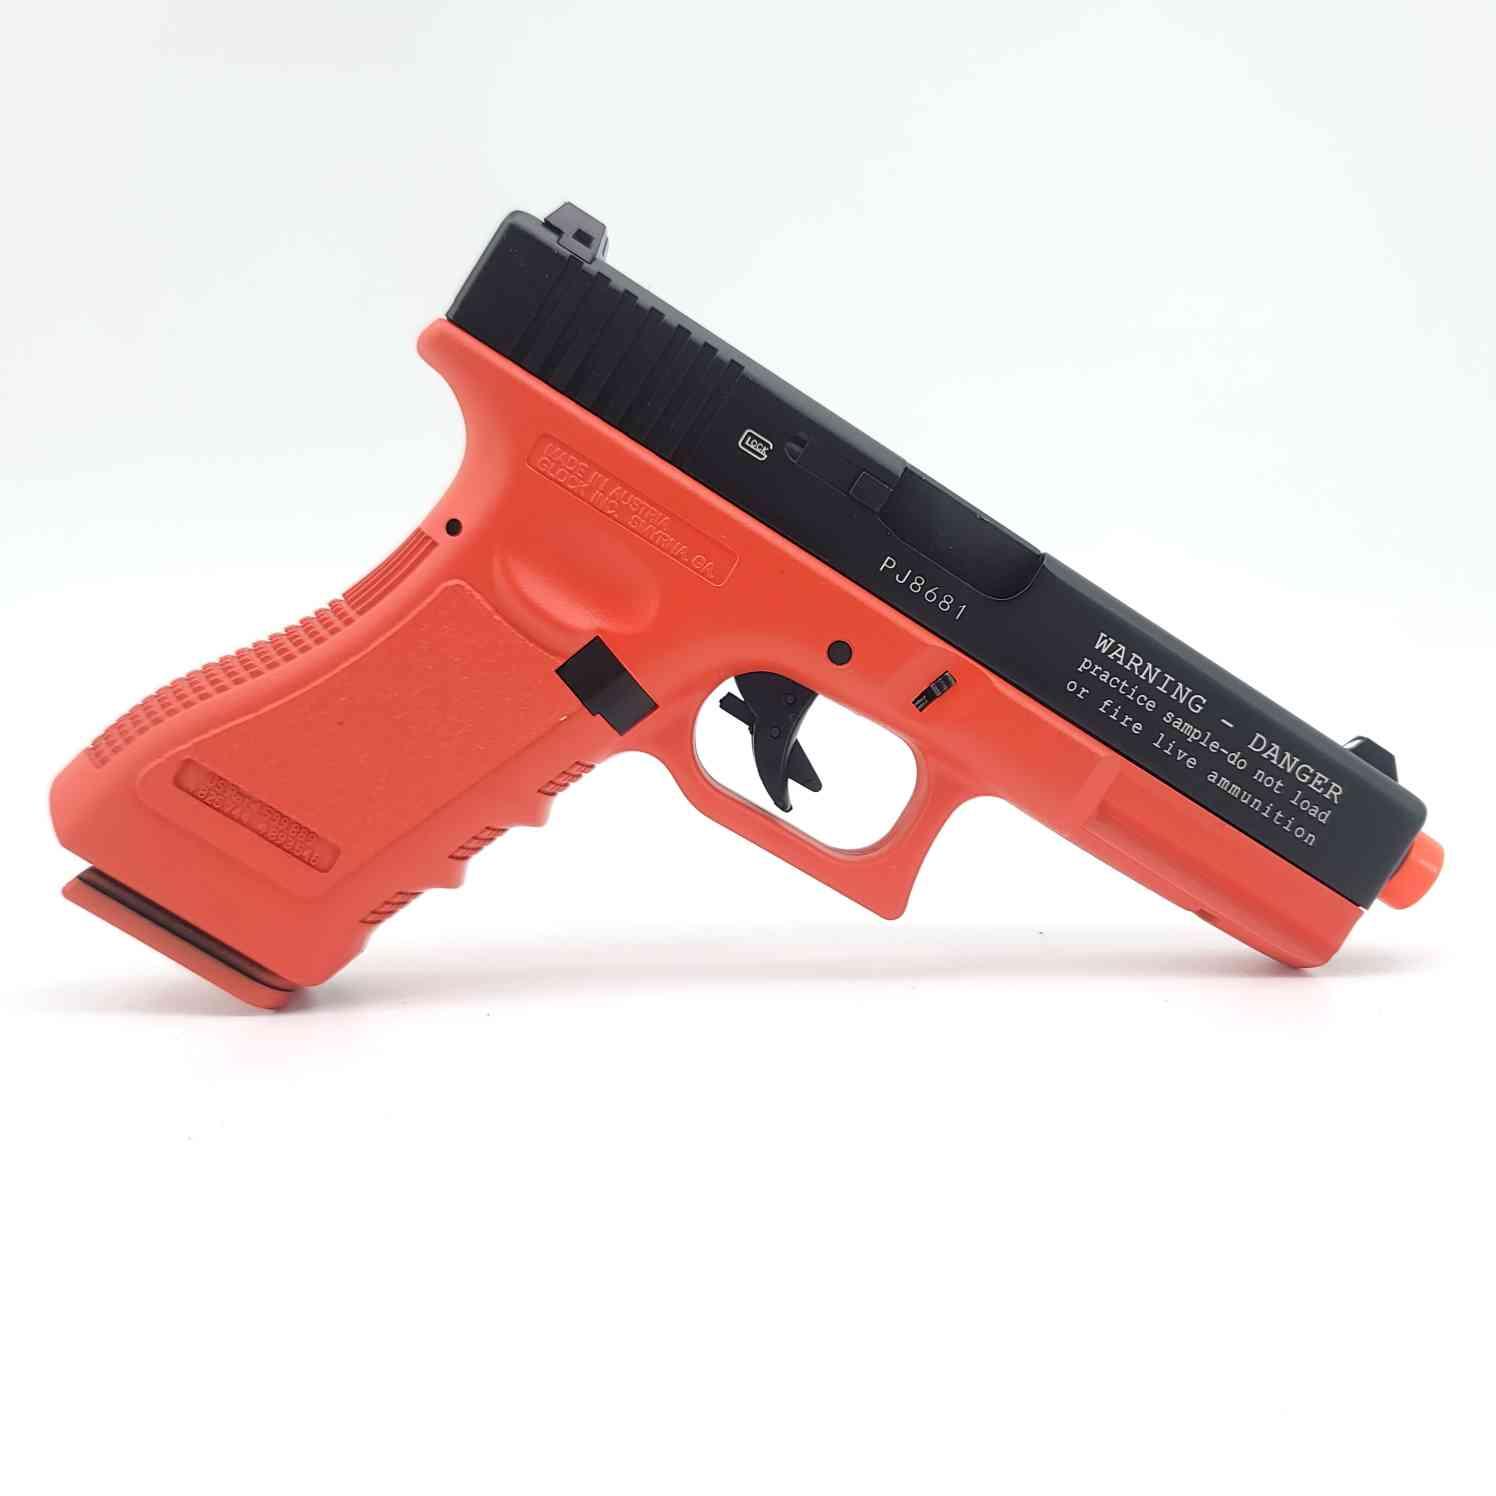 DOUBLE BELL Glock G17P Gen5 SpeedQB Gas Powered Gel Blaster RED [721-3] Renegade Blasters